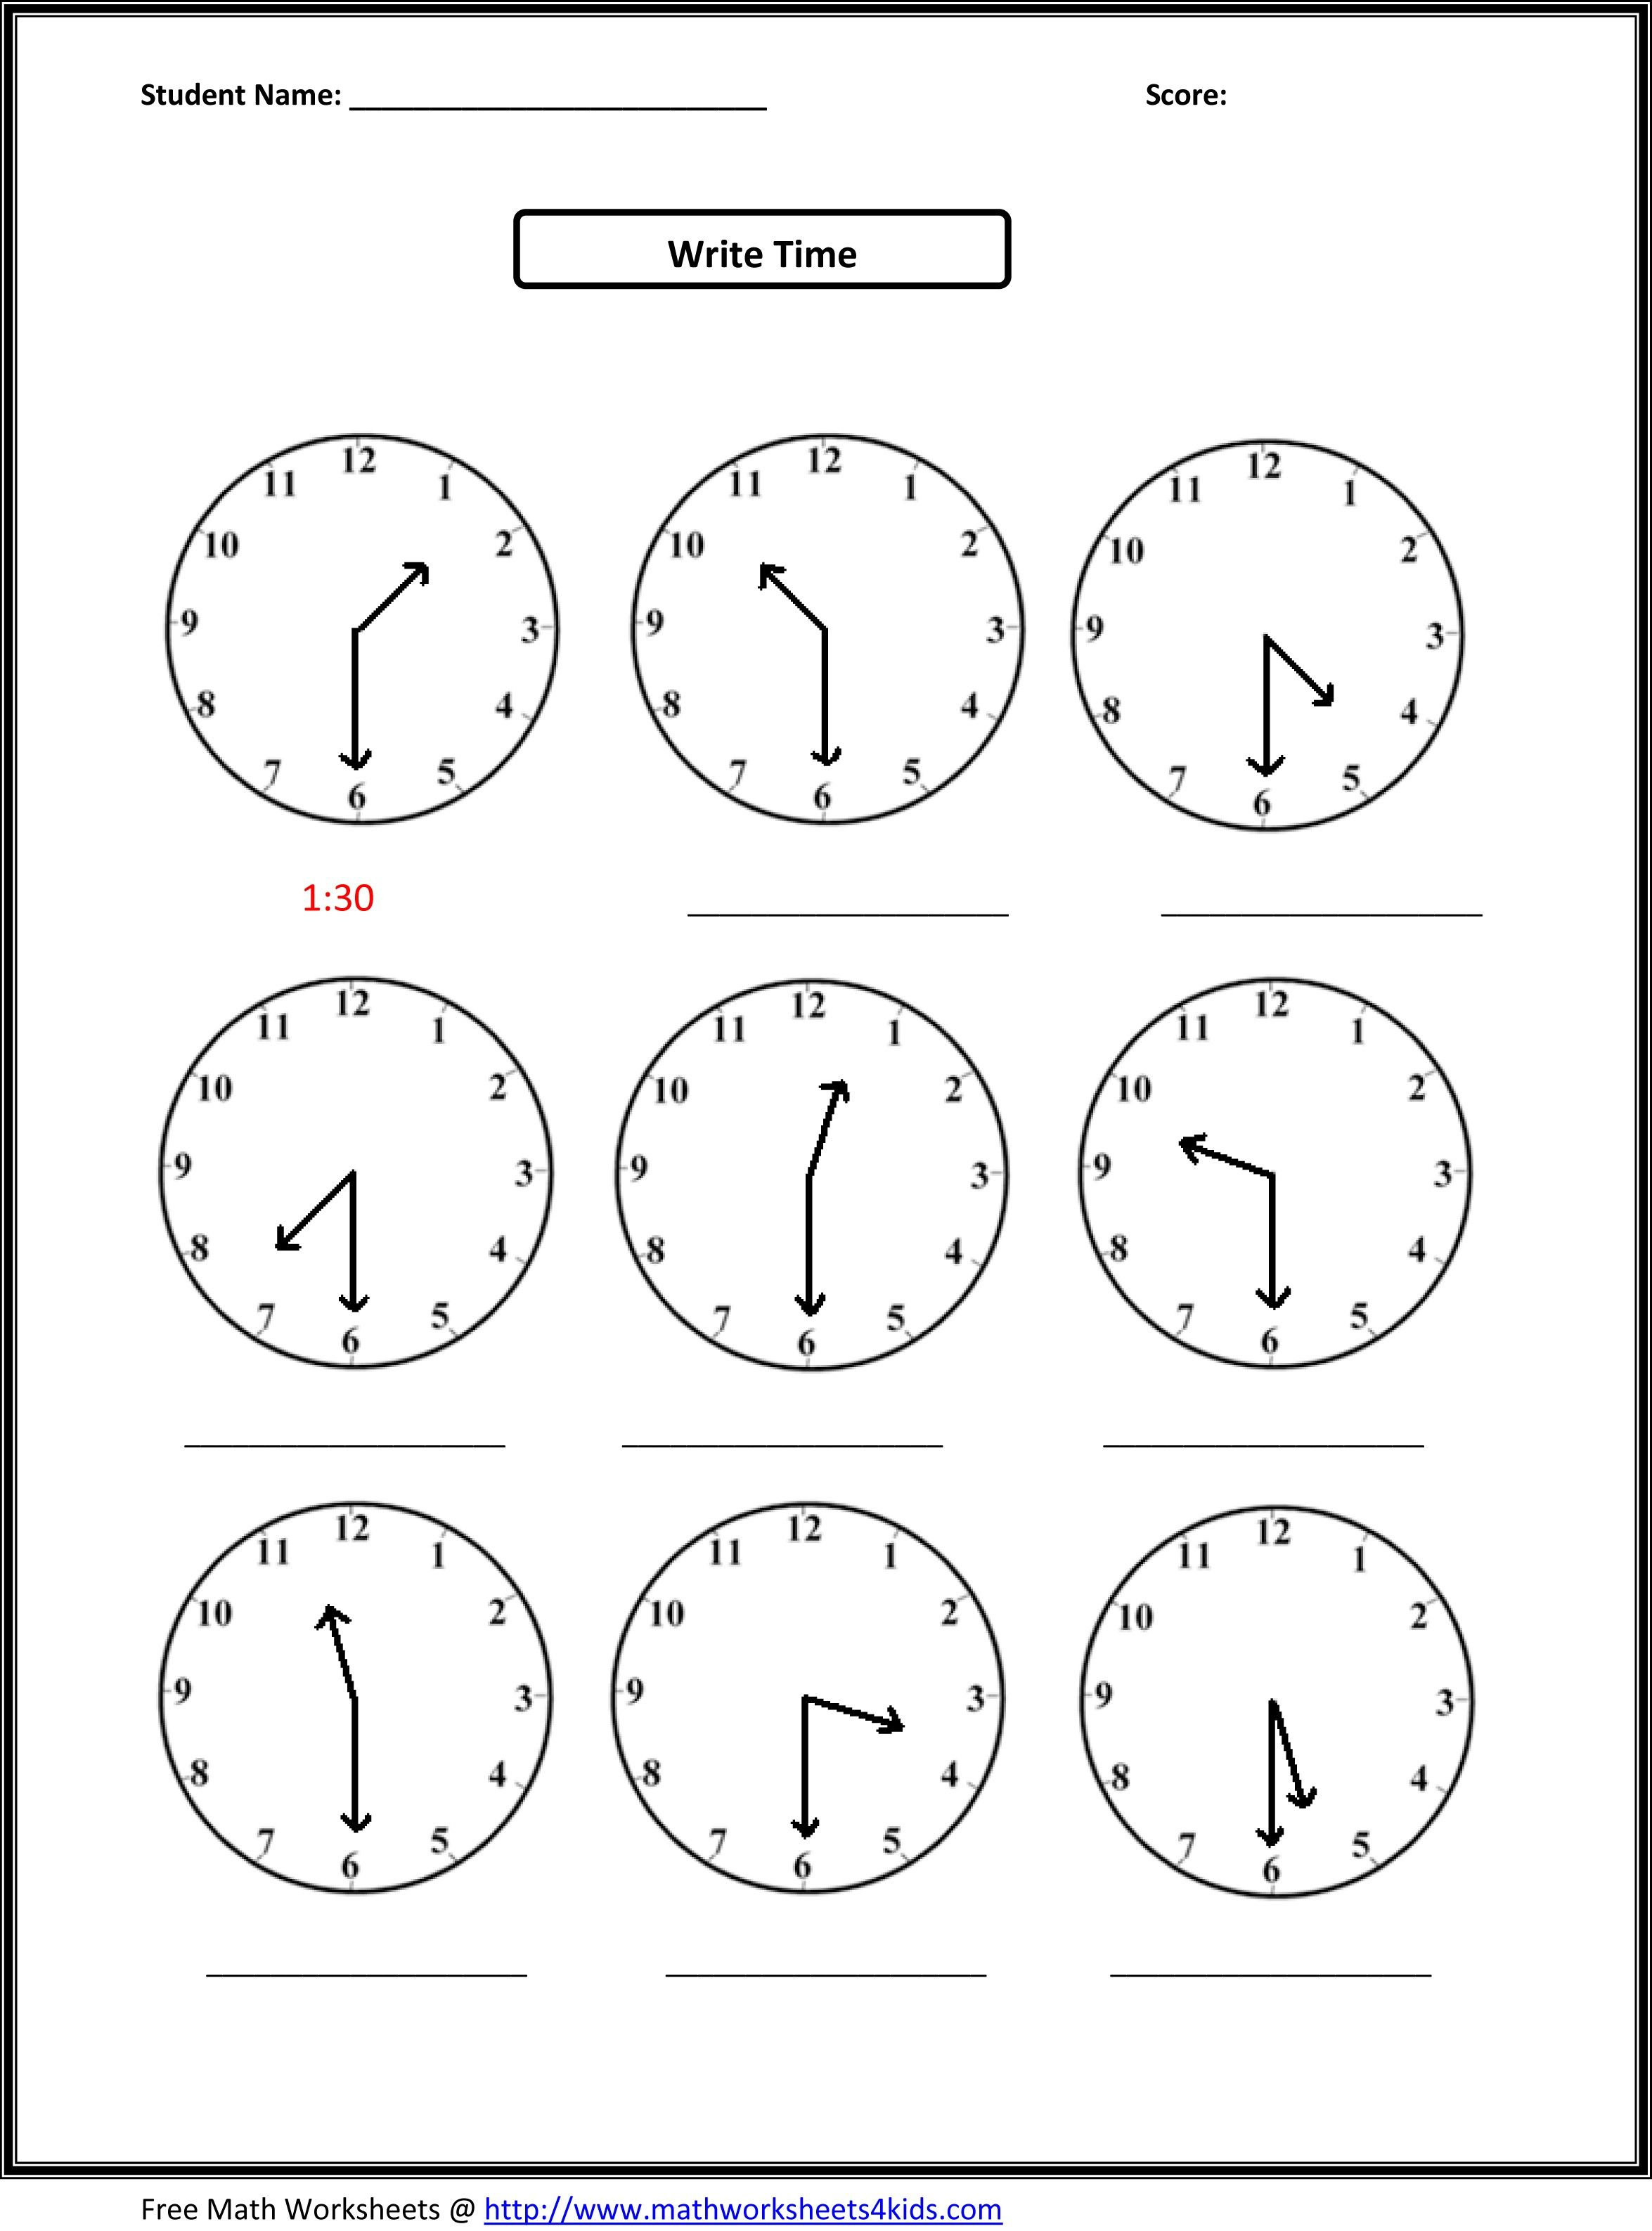 2Nd Grade Free Worksheets Math   Math: Time/measurement   2Nd Grade   Free Printable Worksheets For 2Nd Grade